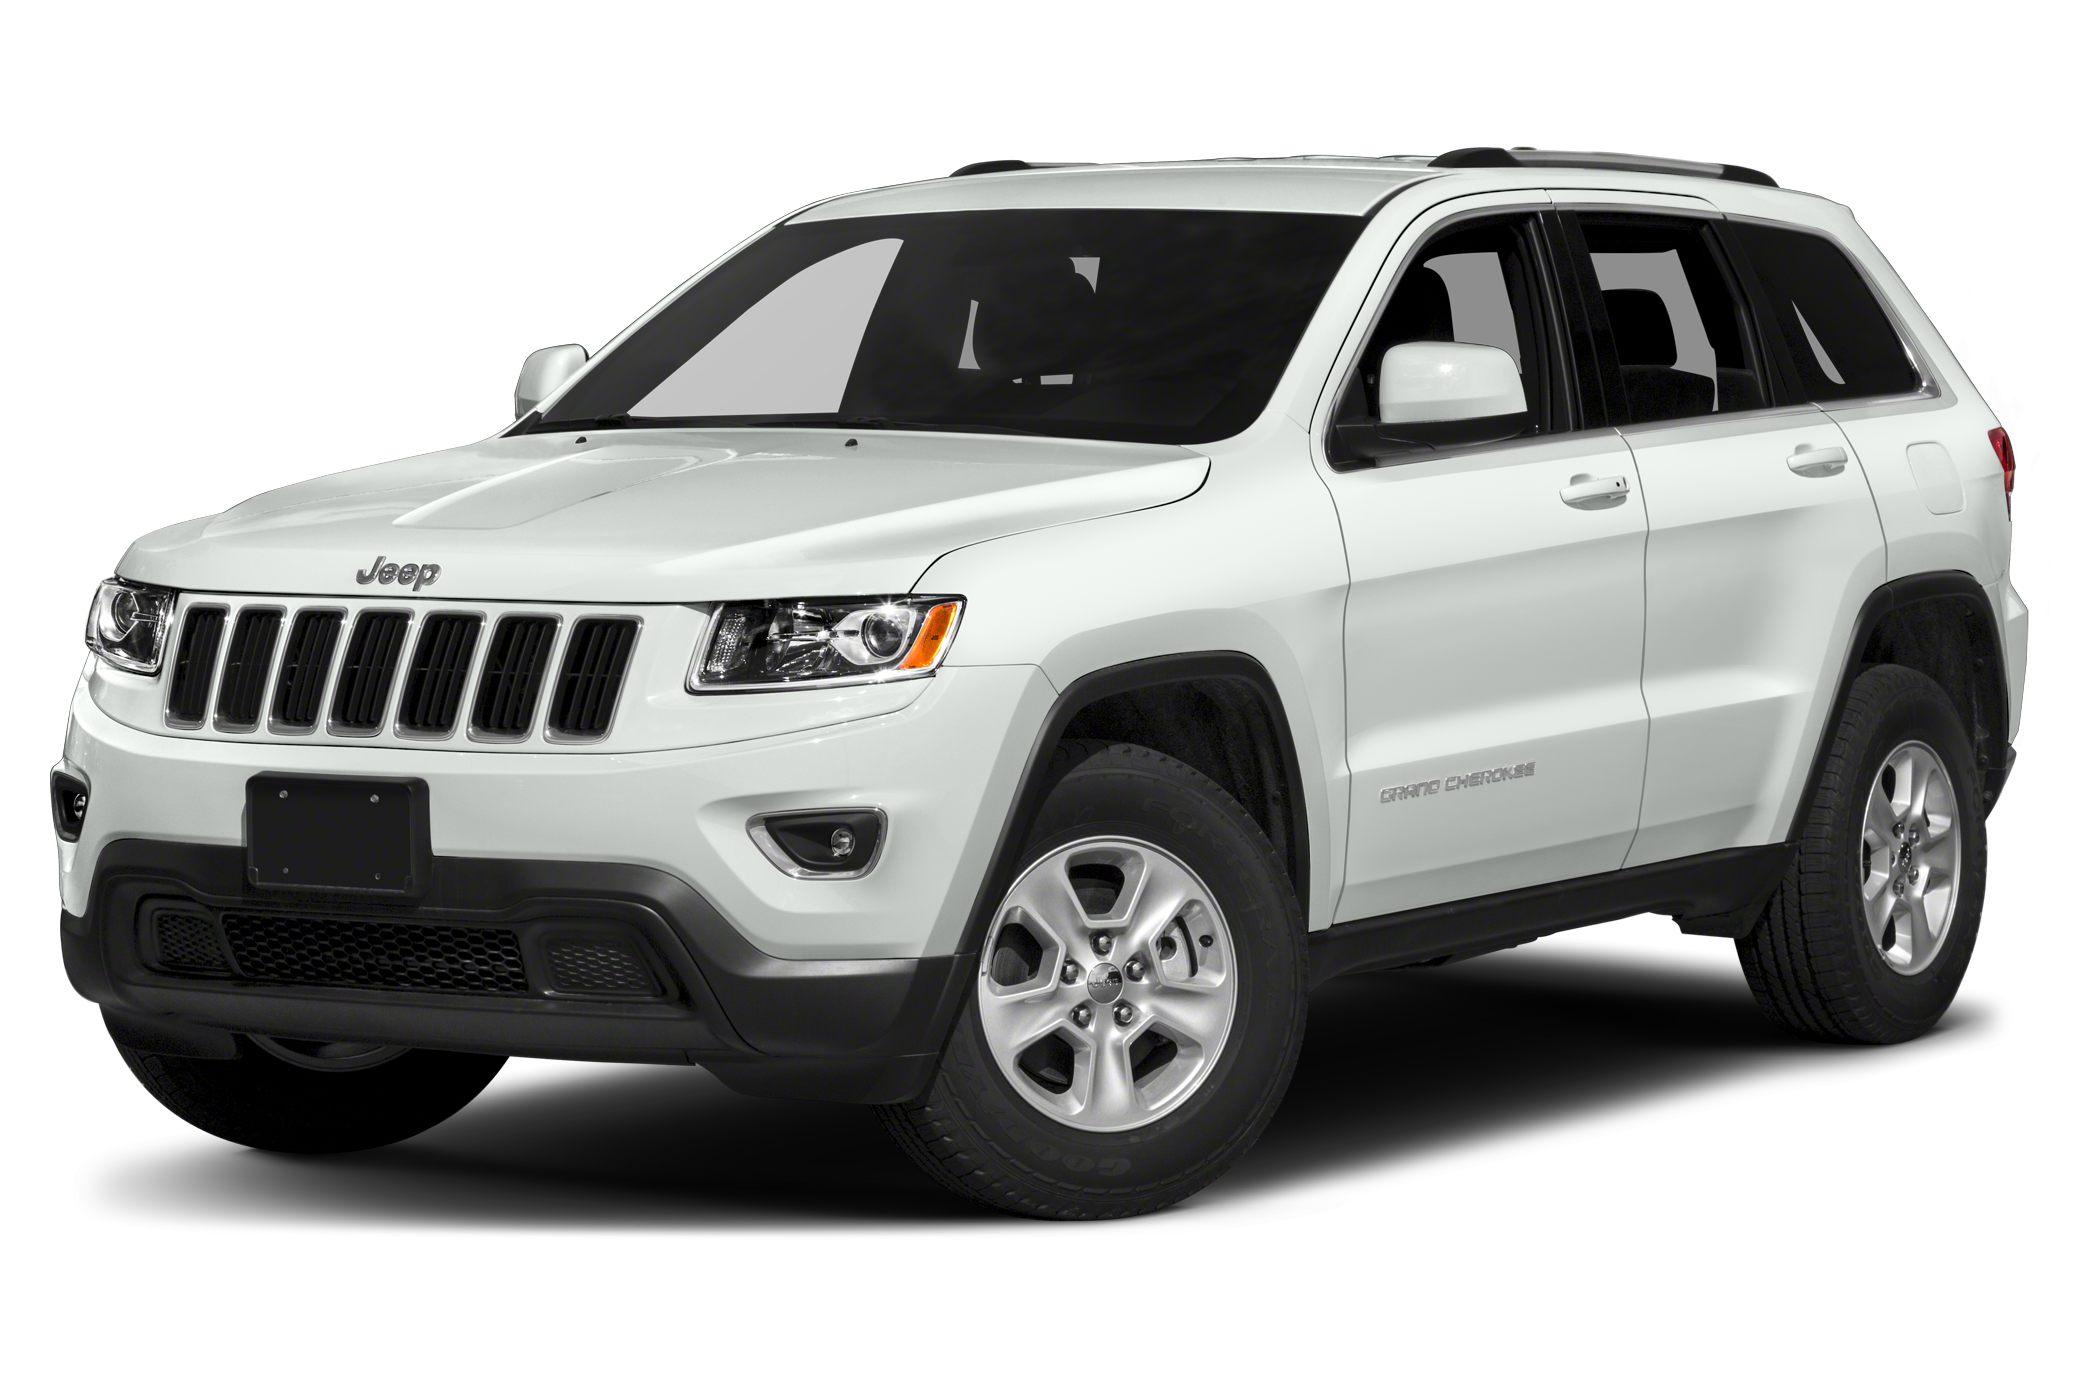 2016 Jeep Grand Cherokee Laredo Miles 30572Color White Stock C5853P VIN 1C4RJEAG2GC358416